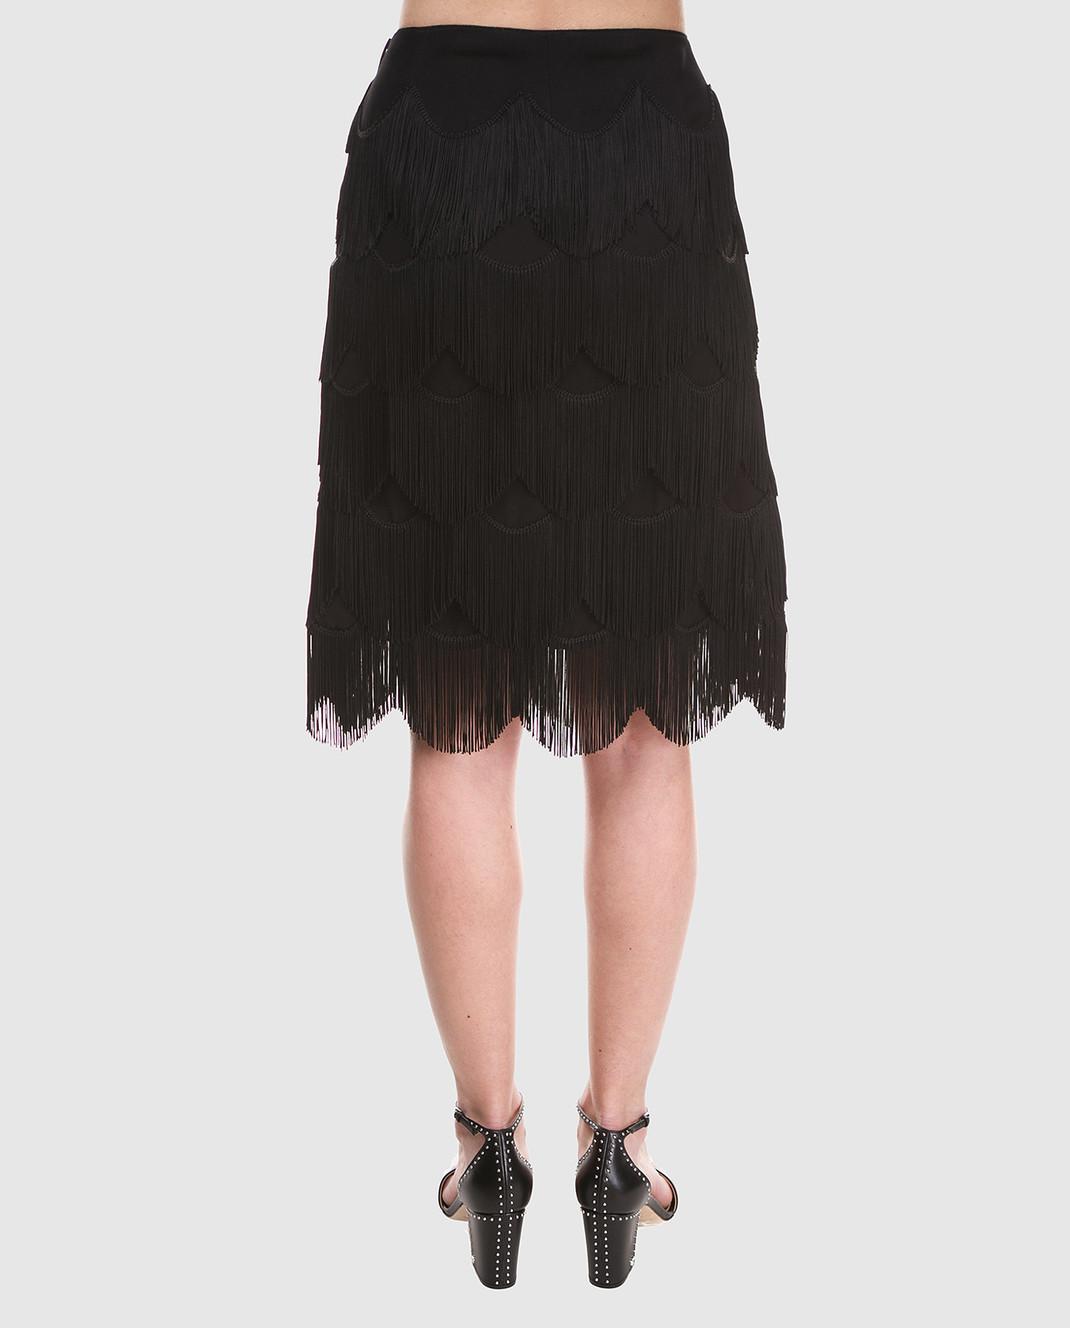 Marc Jacobs Черная юбка с бахромой M4007189 изображение 4